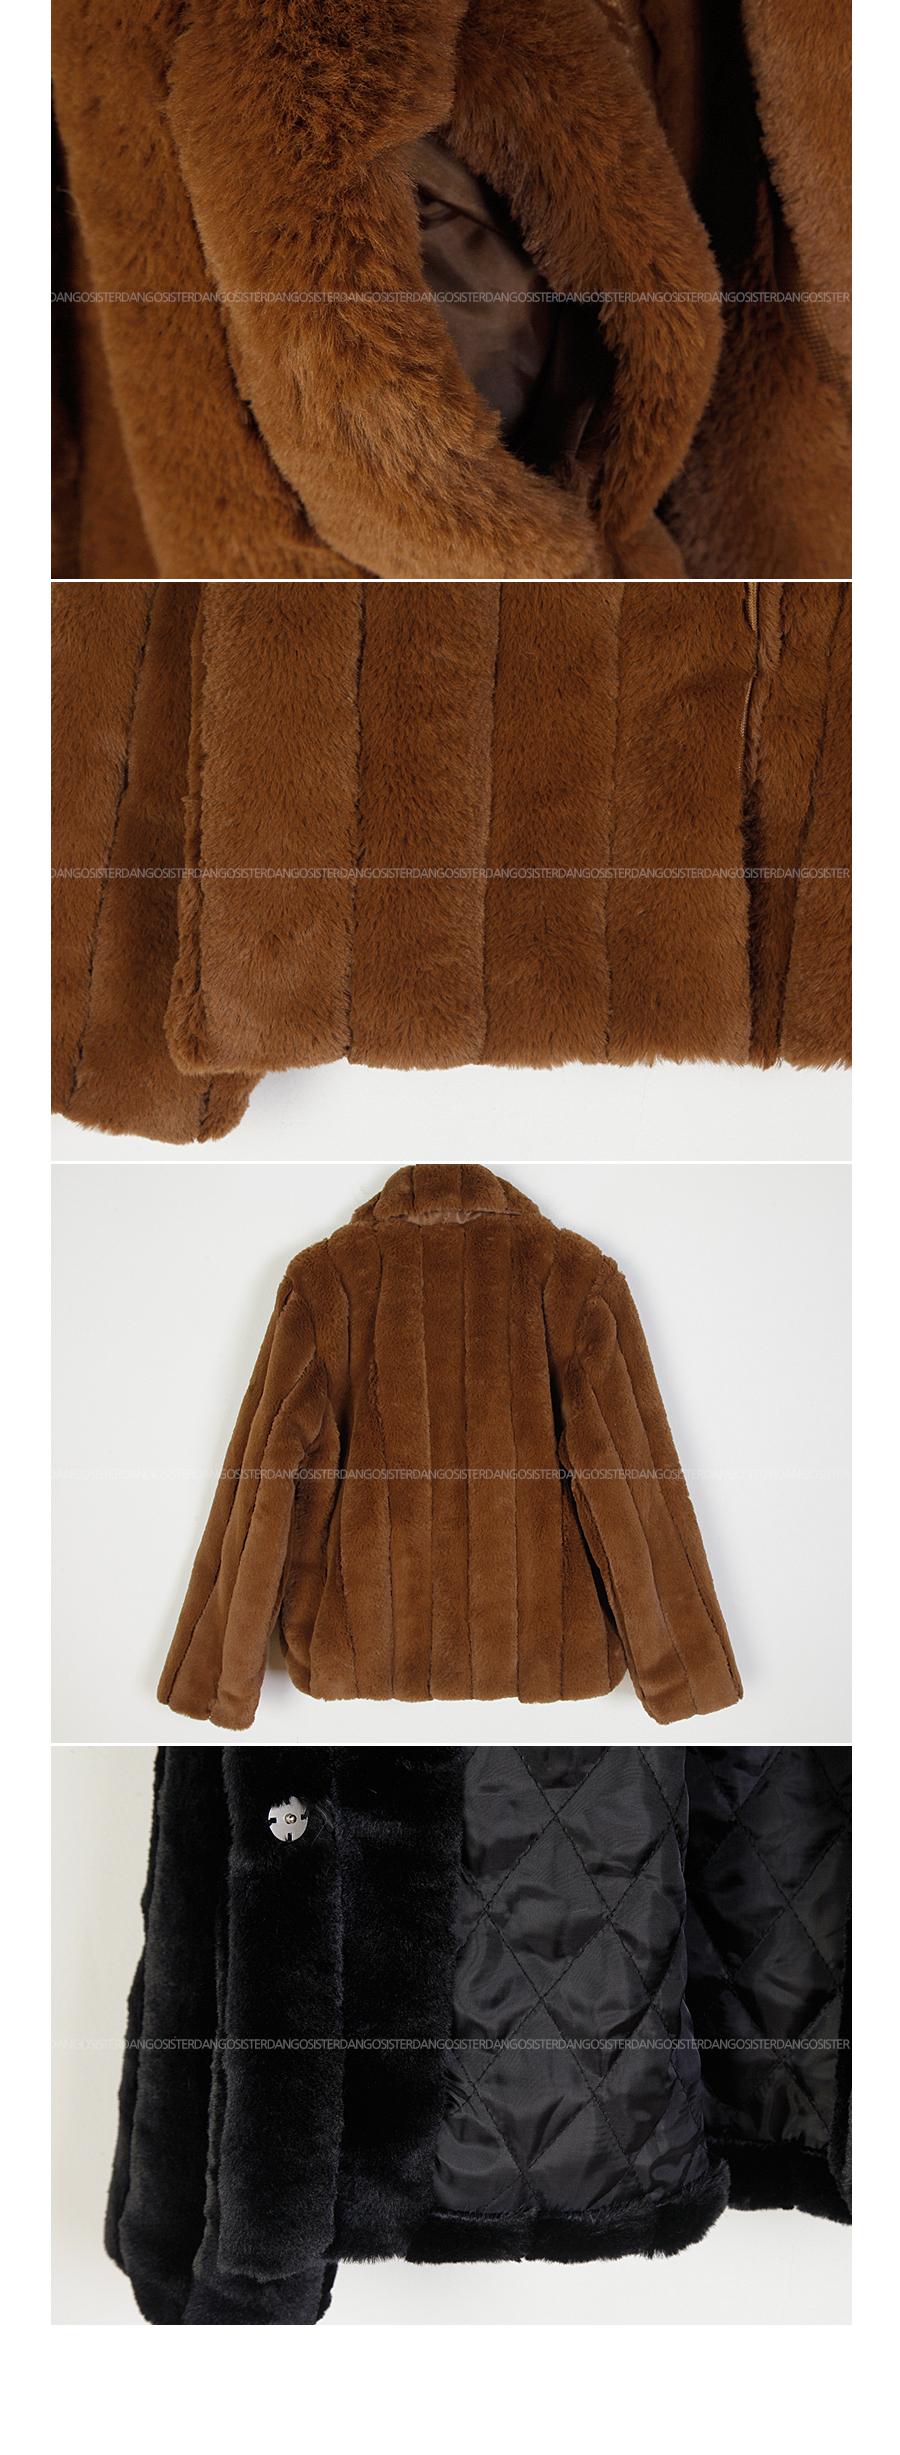 ★Plan★ Closet Fur Jacket